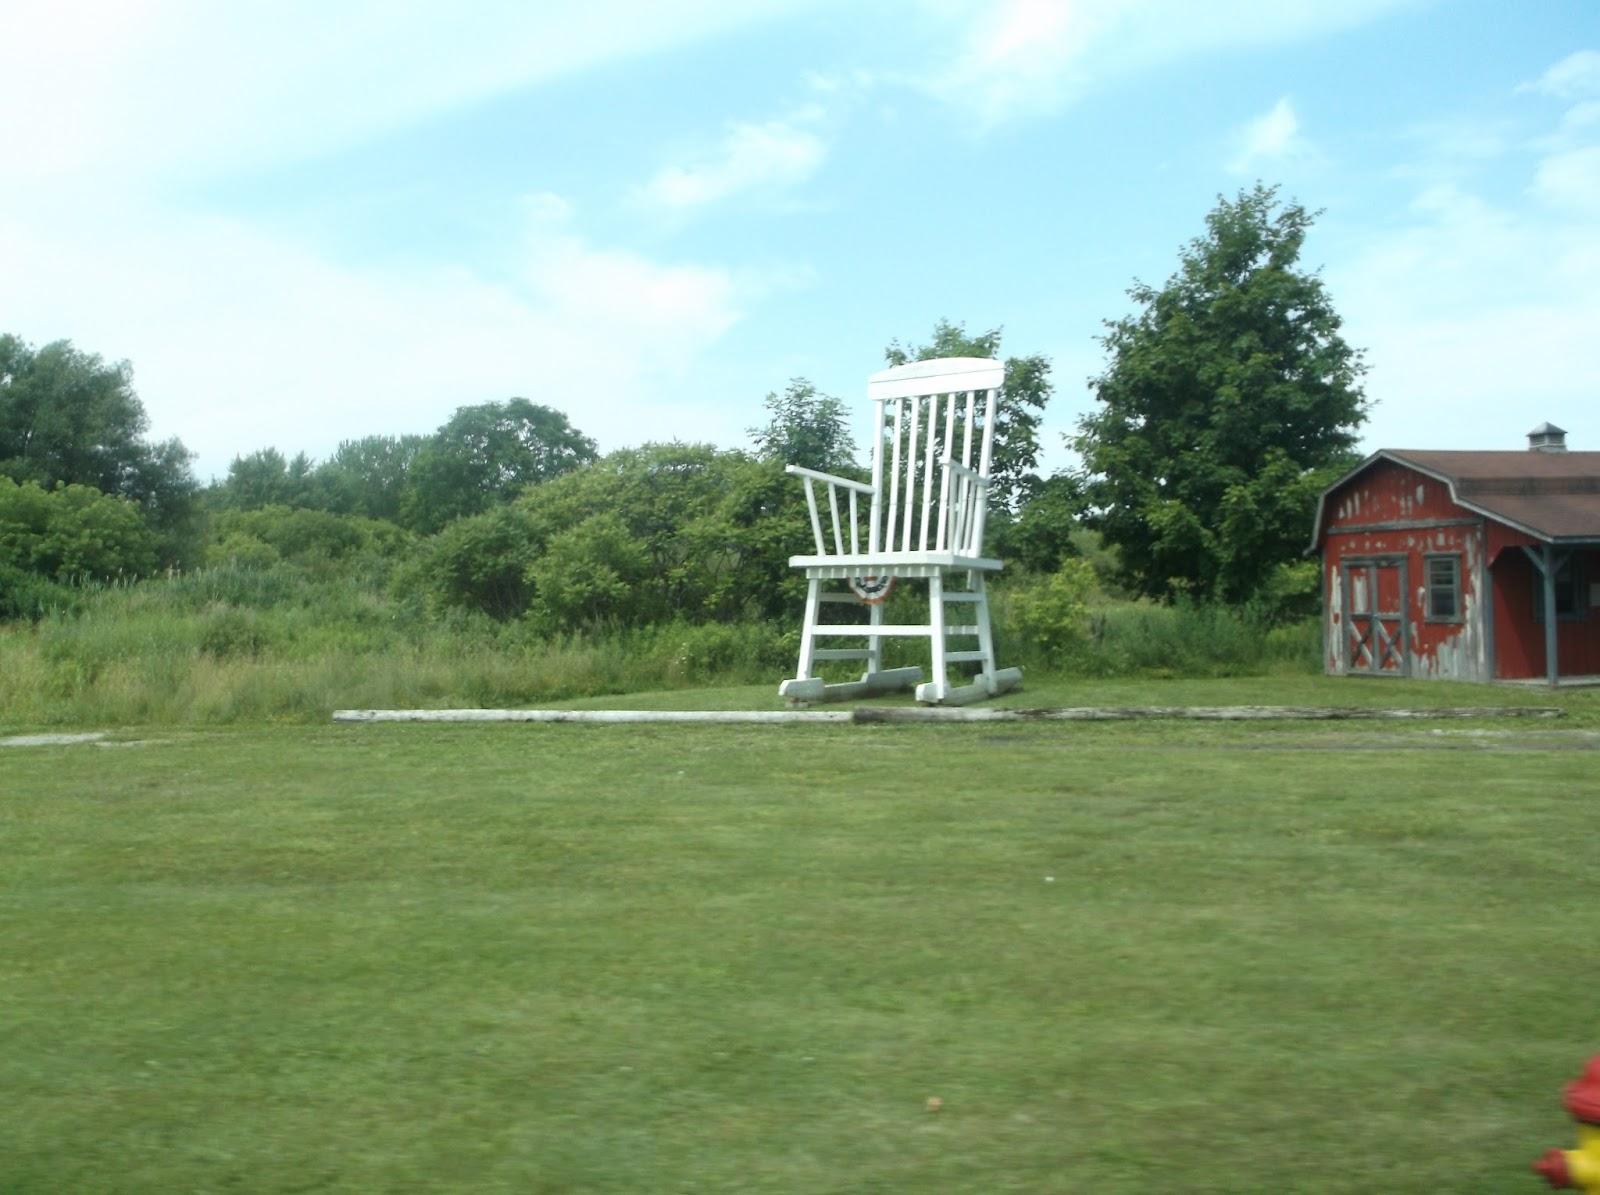 Lily Tomlin Big Rocking Chair